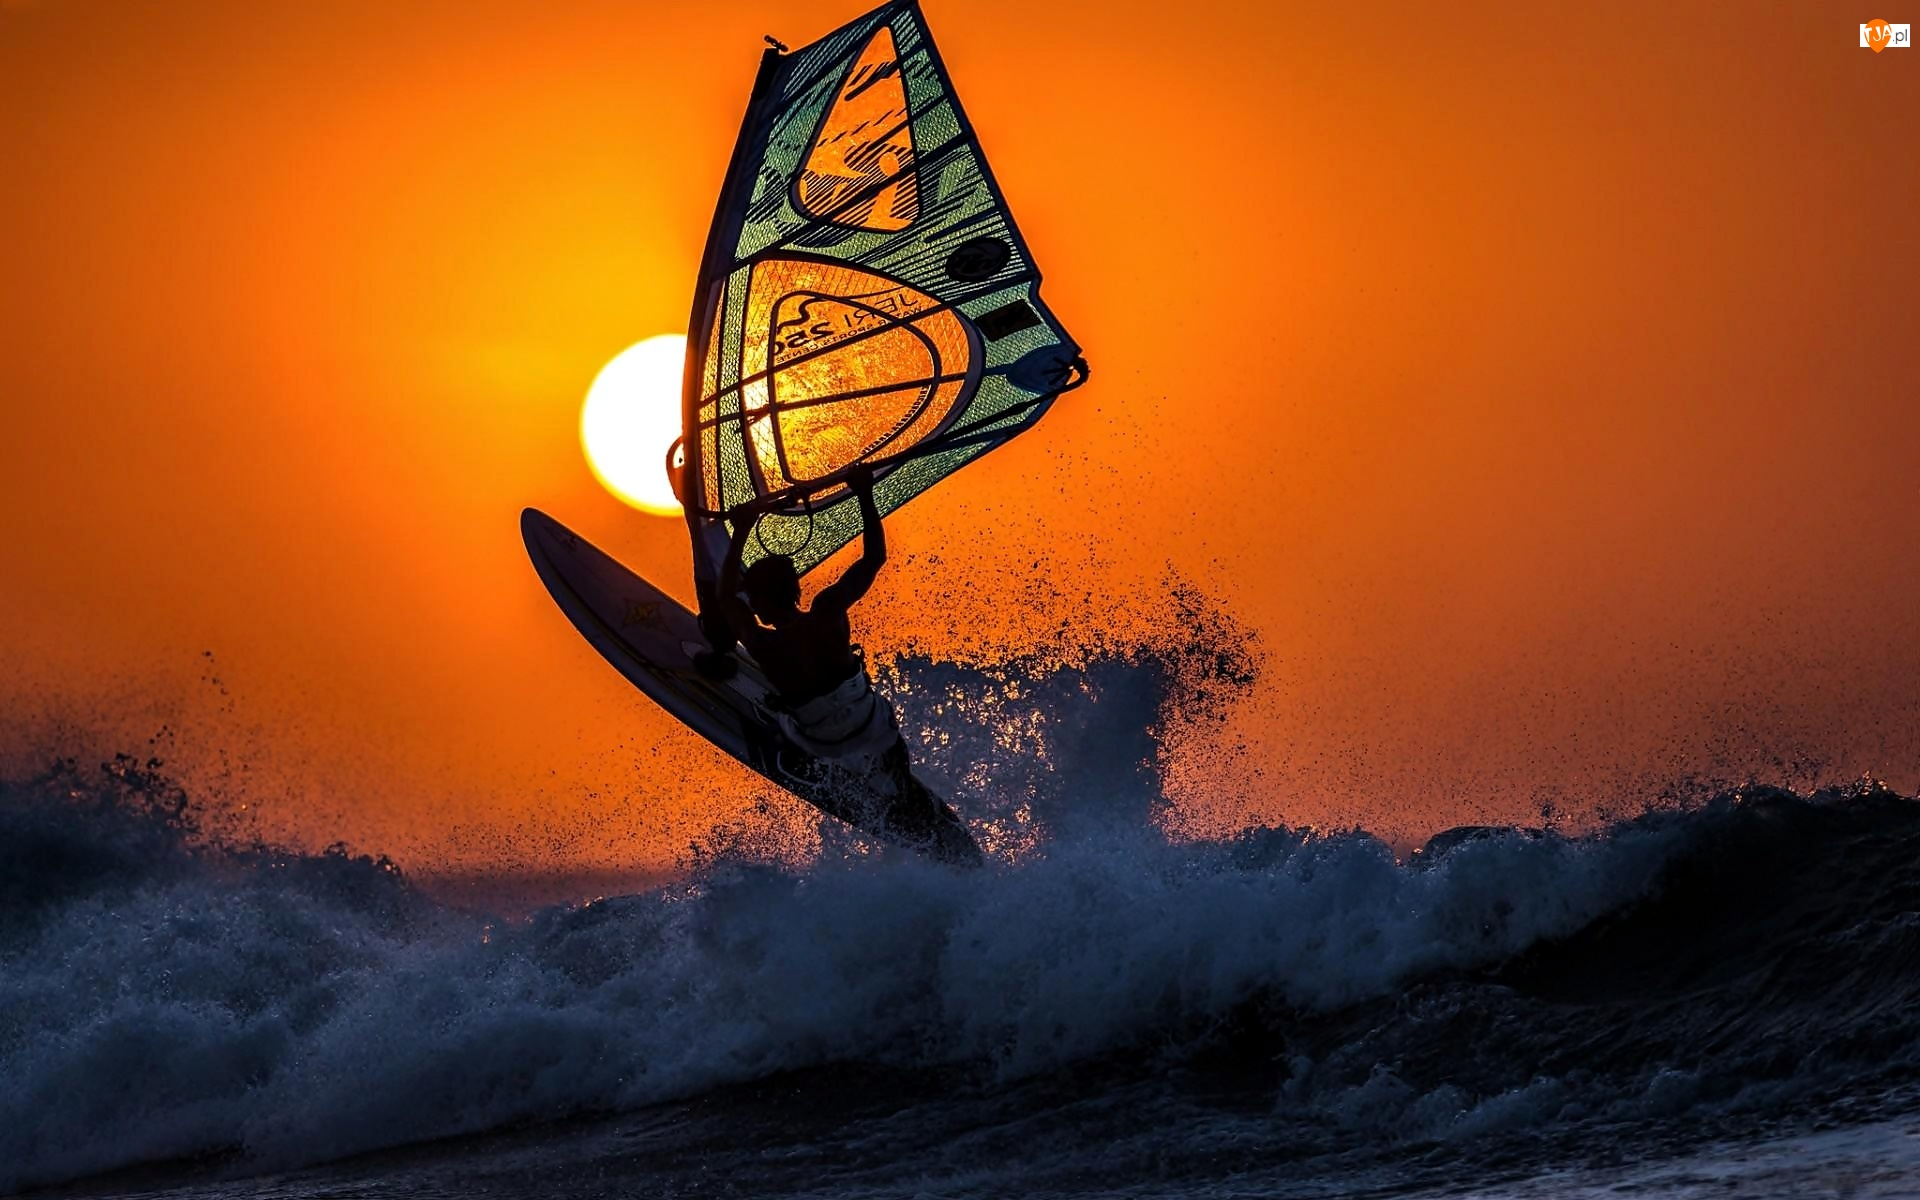 Windsurfing, Słońca, Morze, Zachód